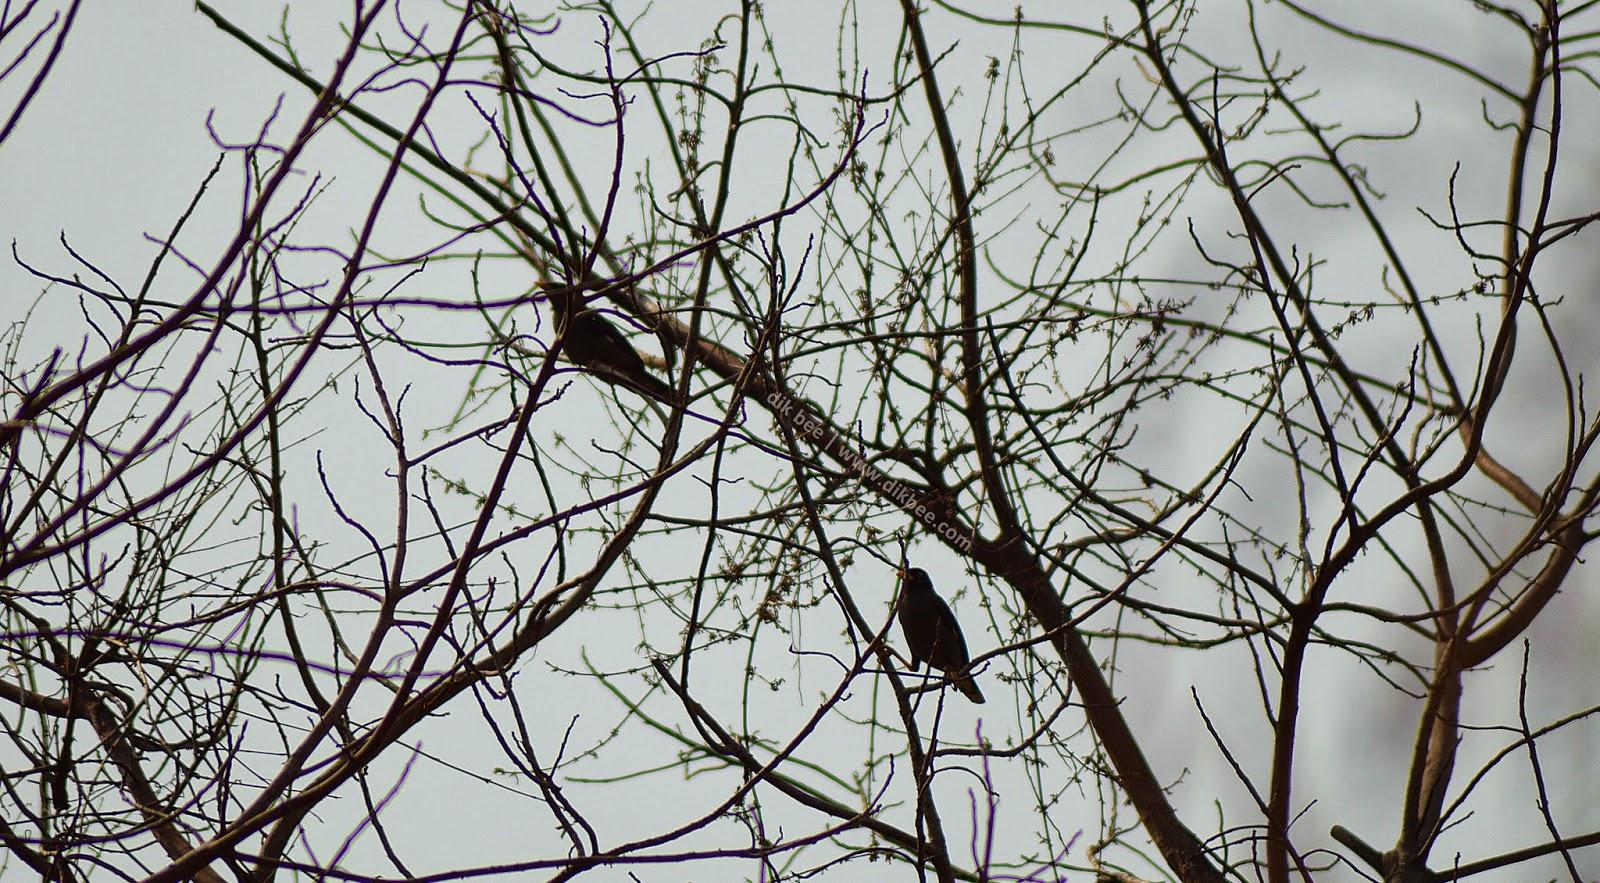 Aktiviti Mengecam Burung Di Kuala Kubu Bharu | Birdwatching Activity